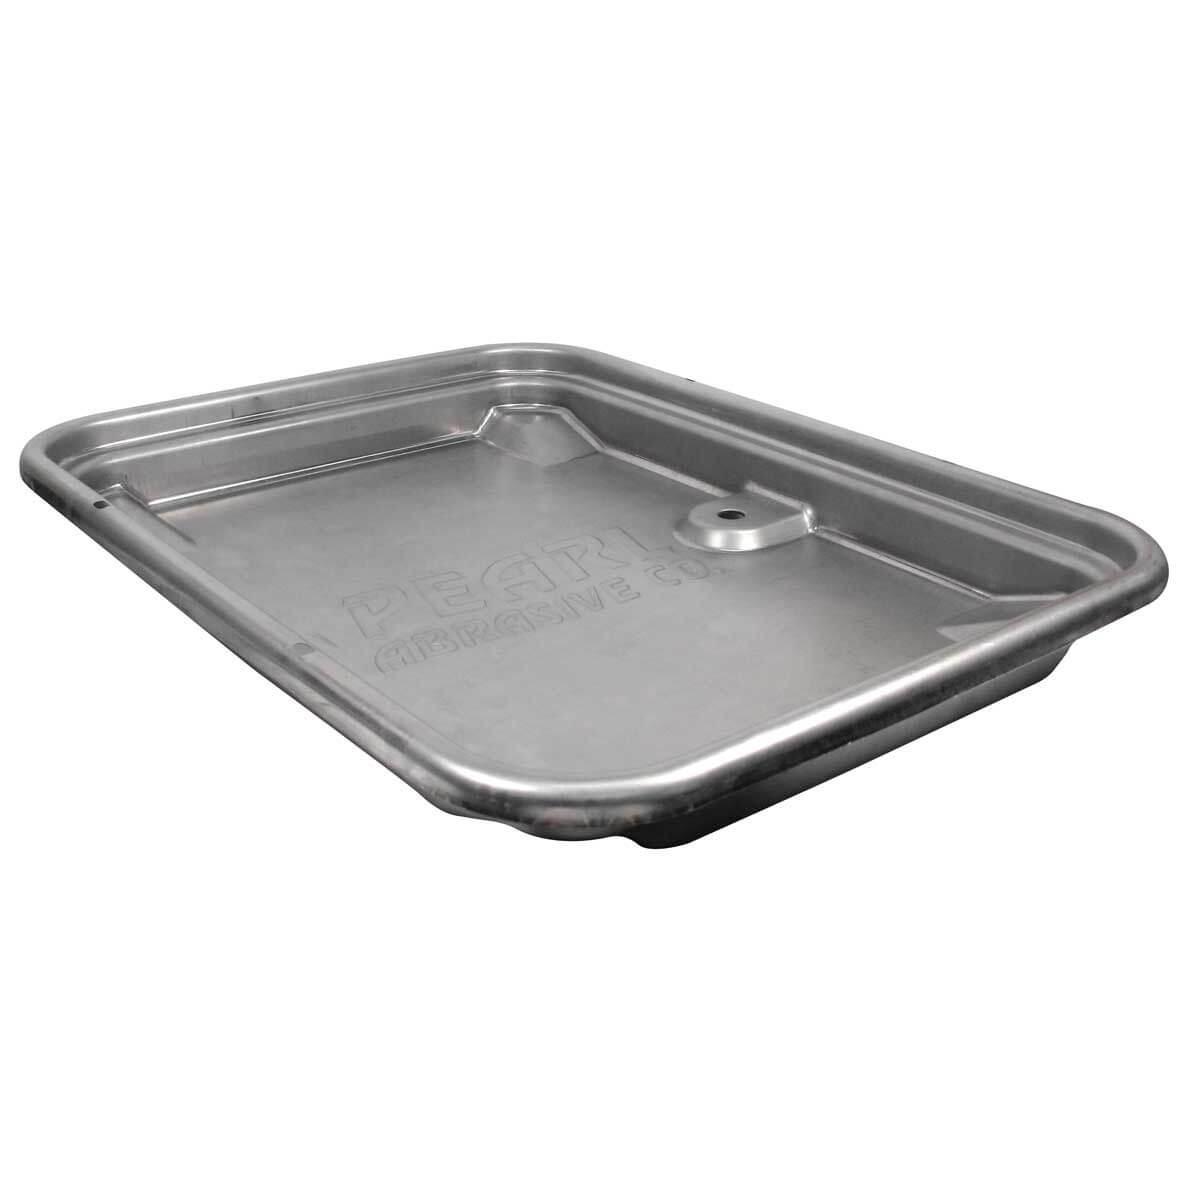 Stainless Steel Pan Pearl Tile saw